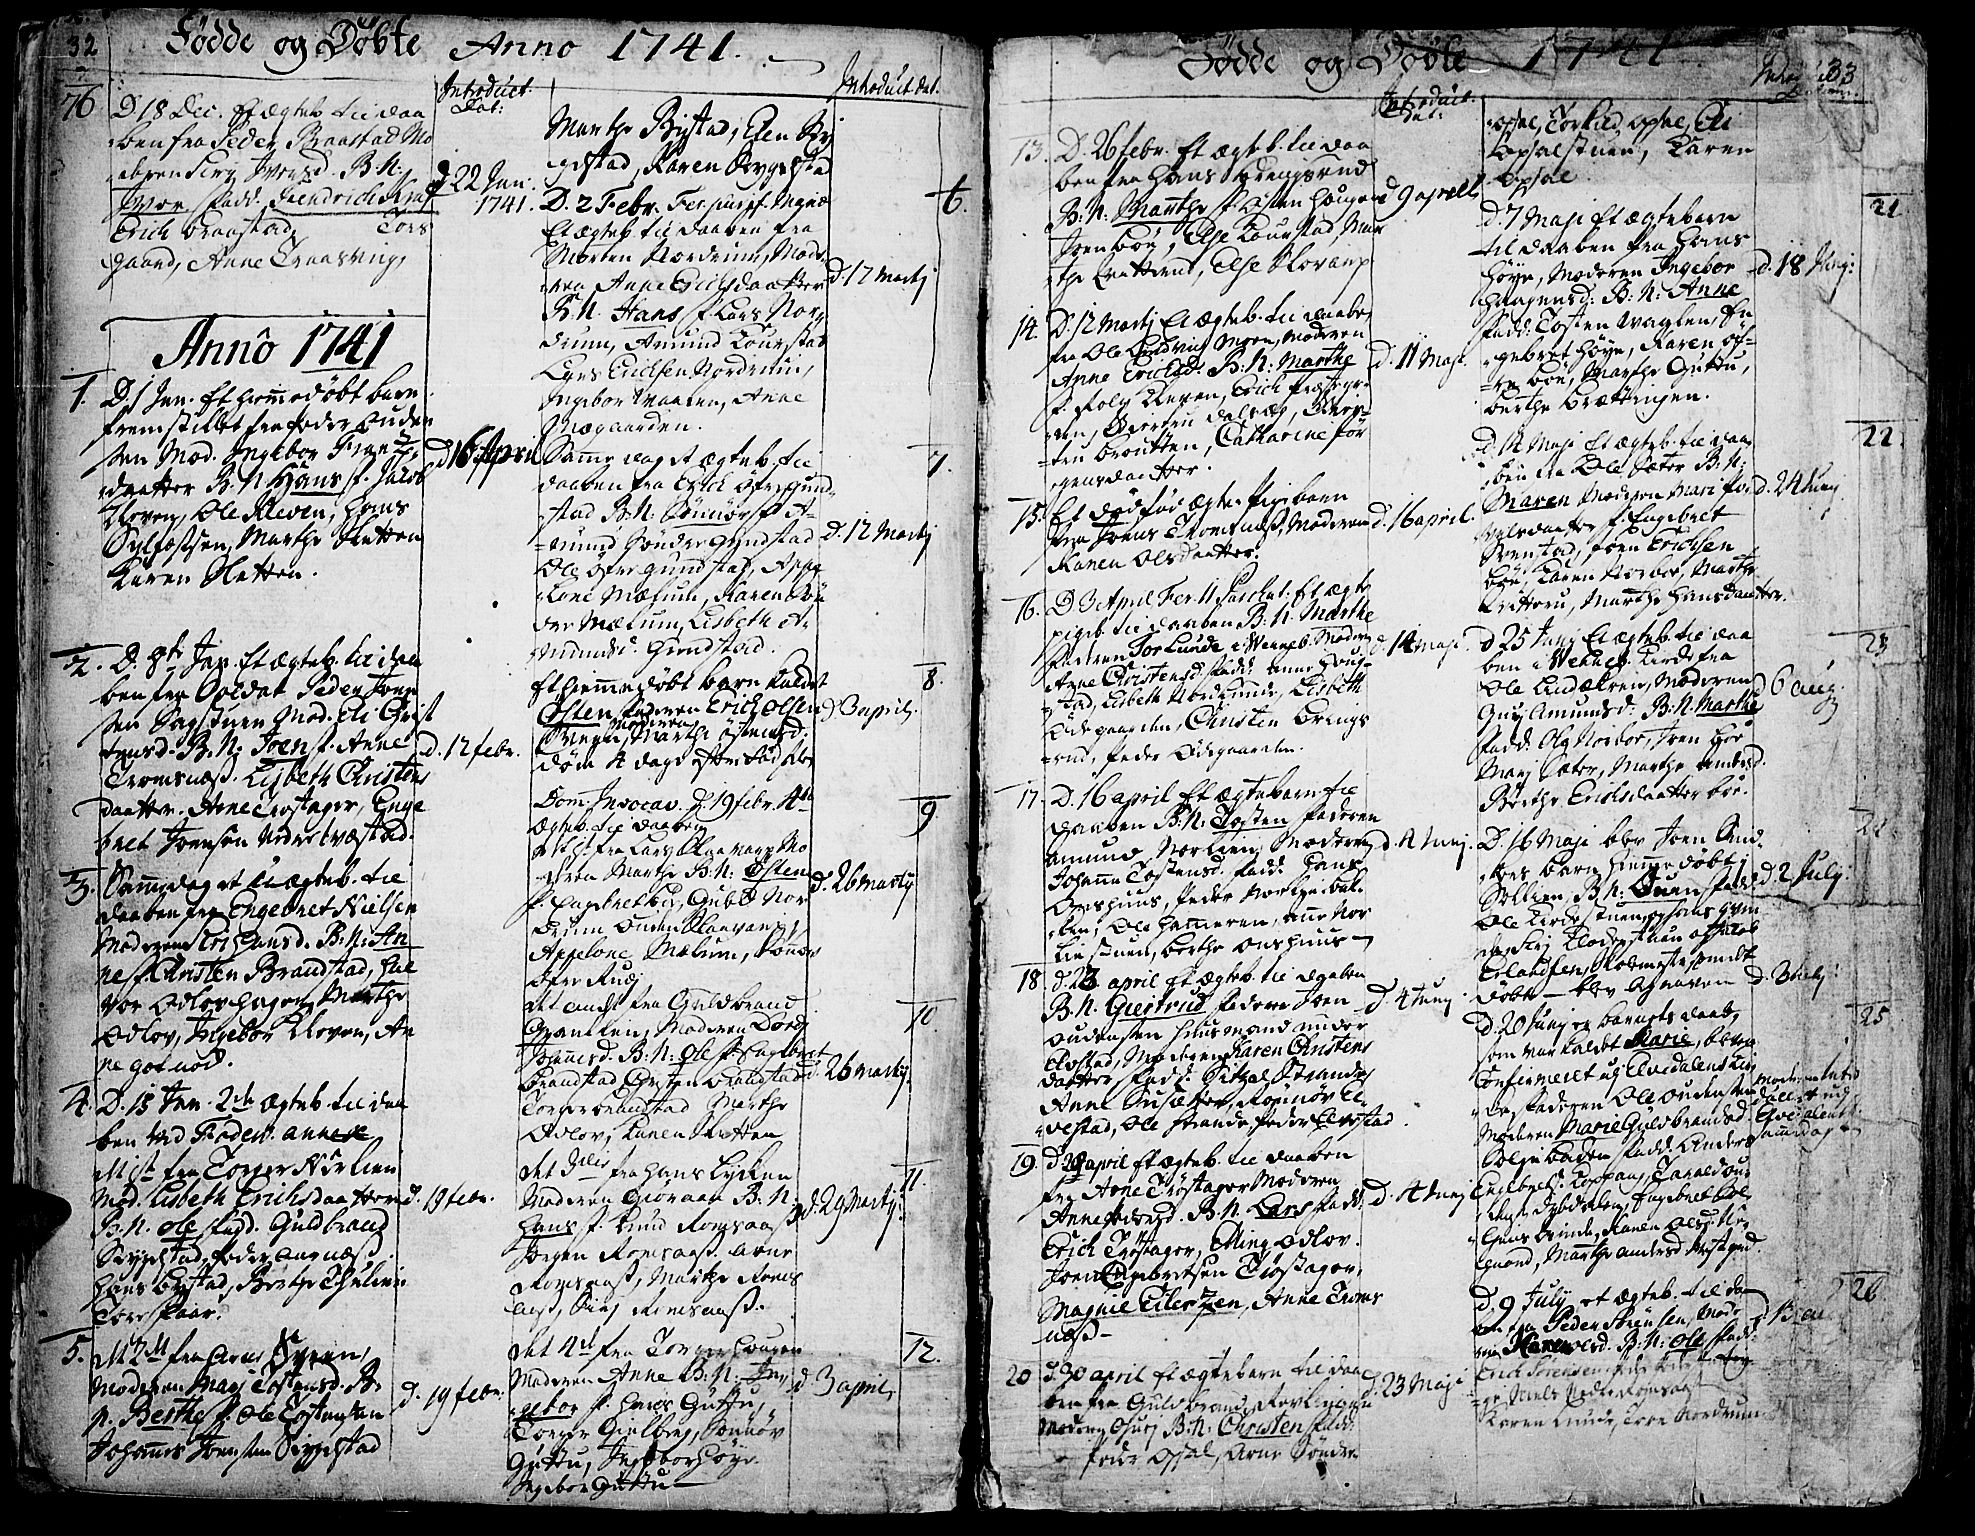 SAH, Ringebu prestekontor, Ministerialbok nr. 2, 1734-1780, s. 32-33